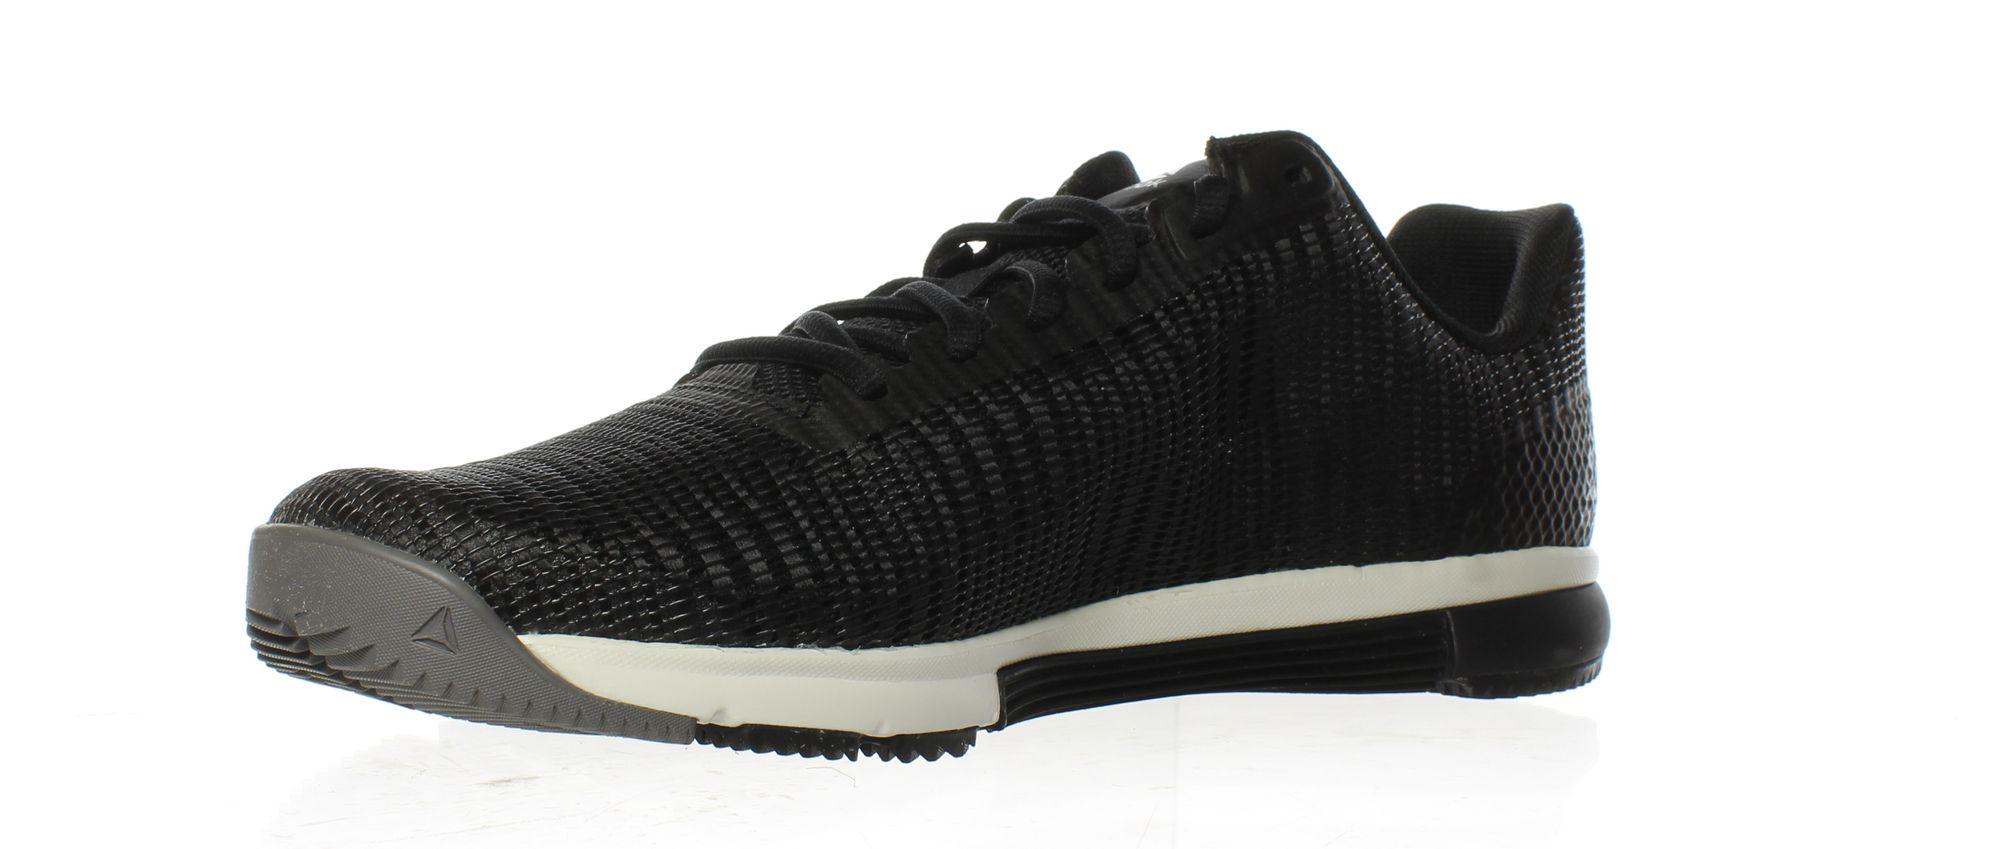 Reebok-Mens-Athletic-Speed-TR-Flexweave-Cross-Training-Shoes thumbnail 7